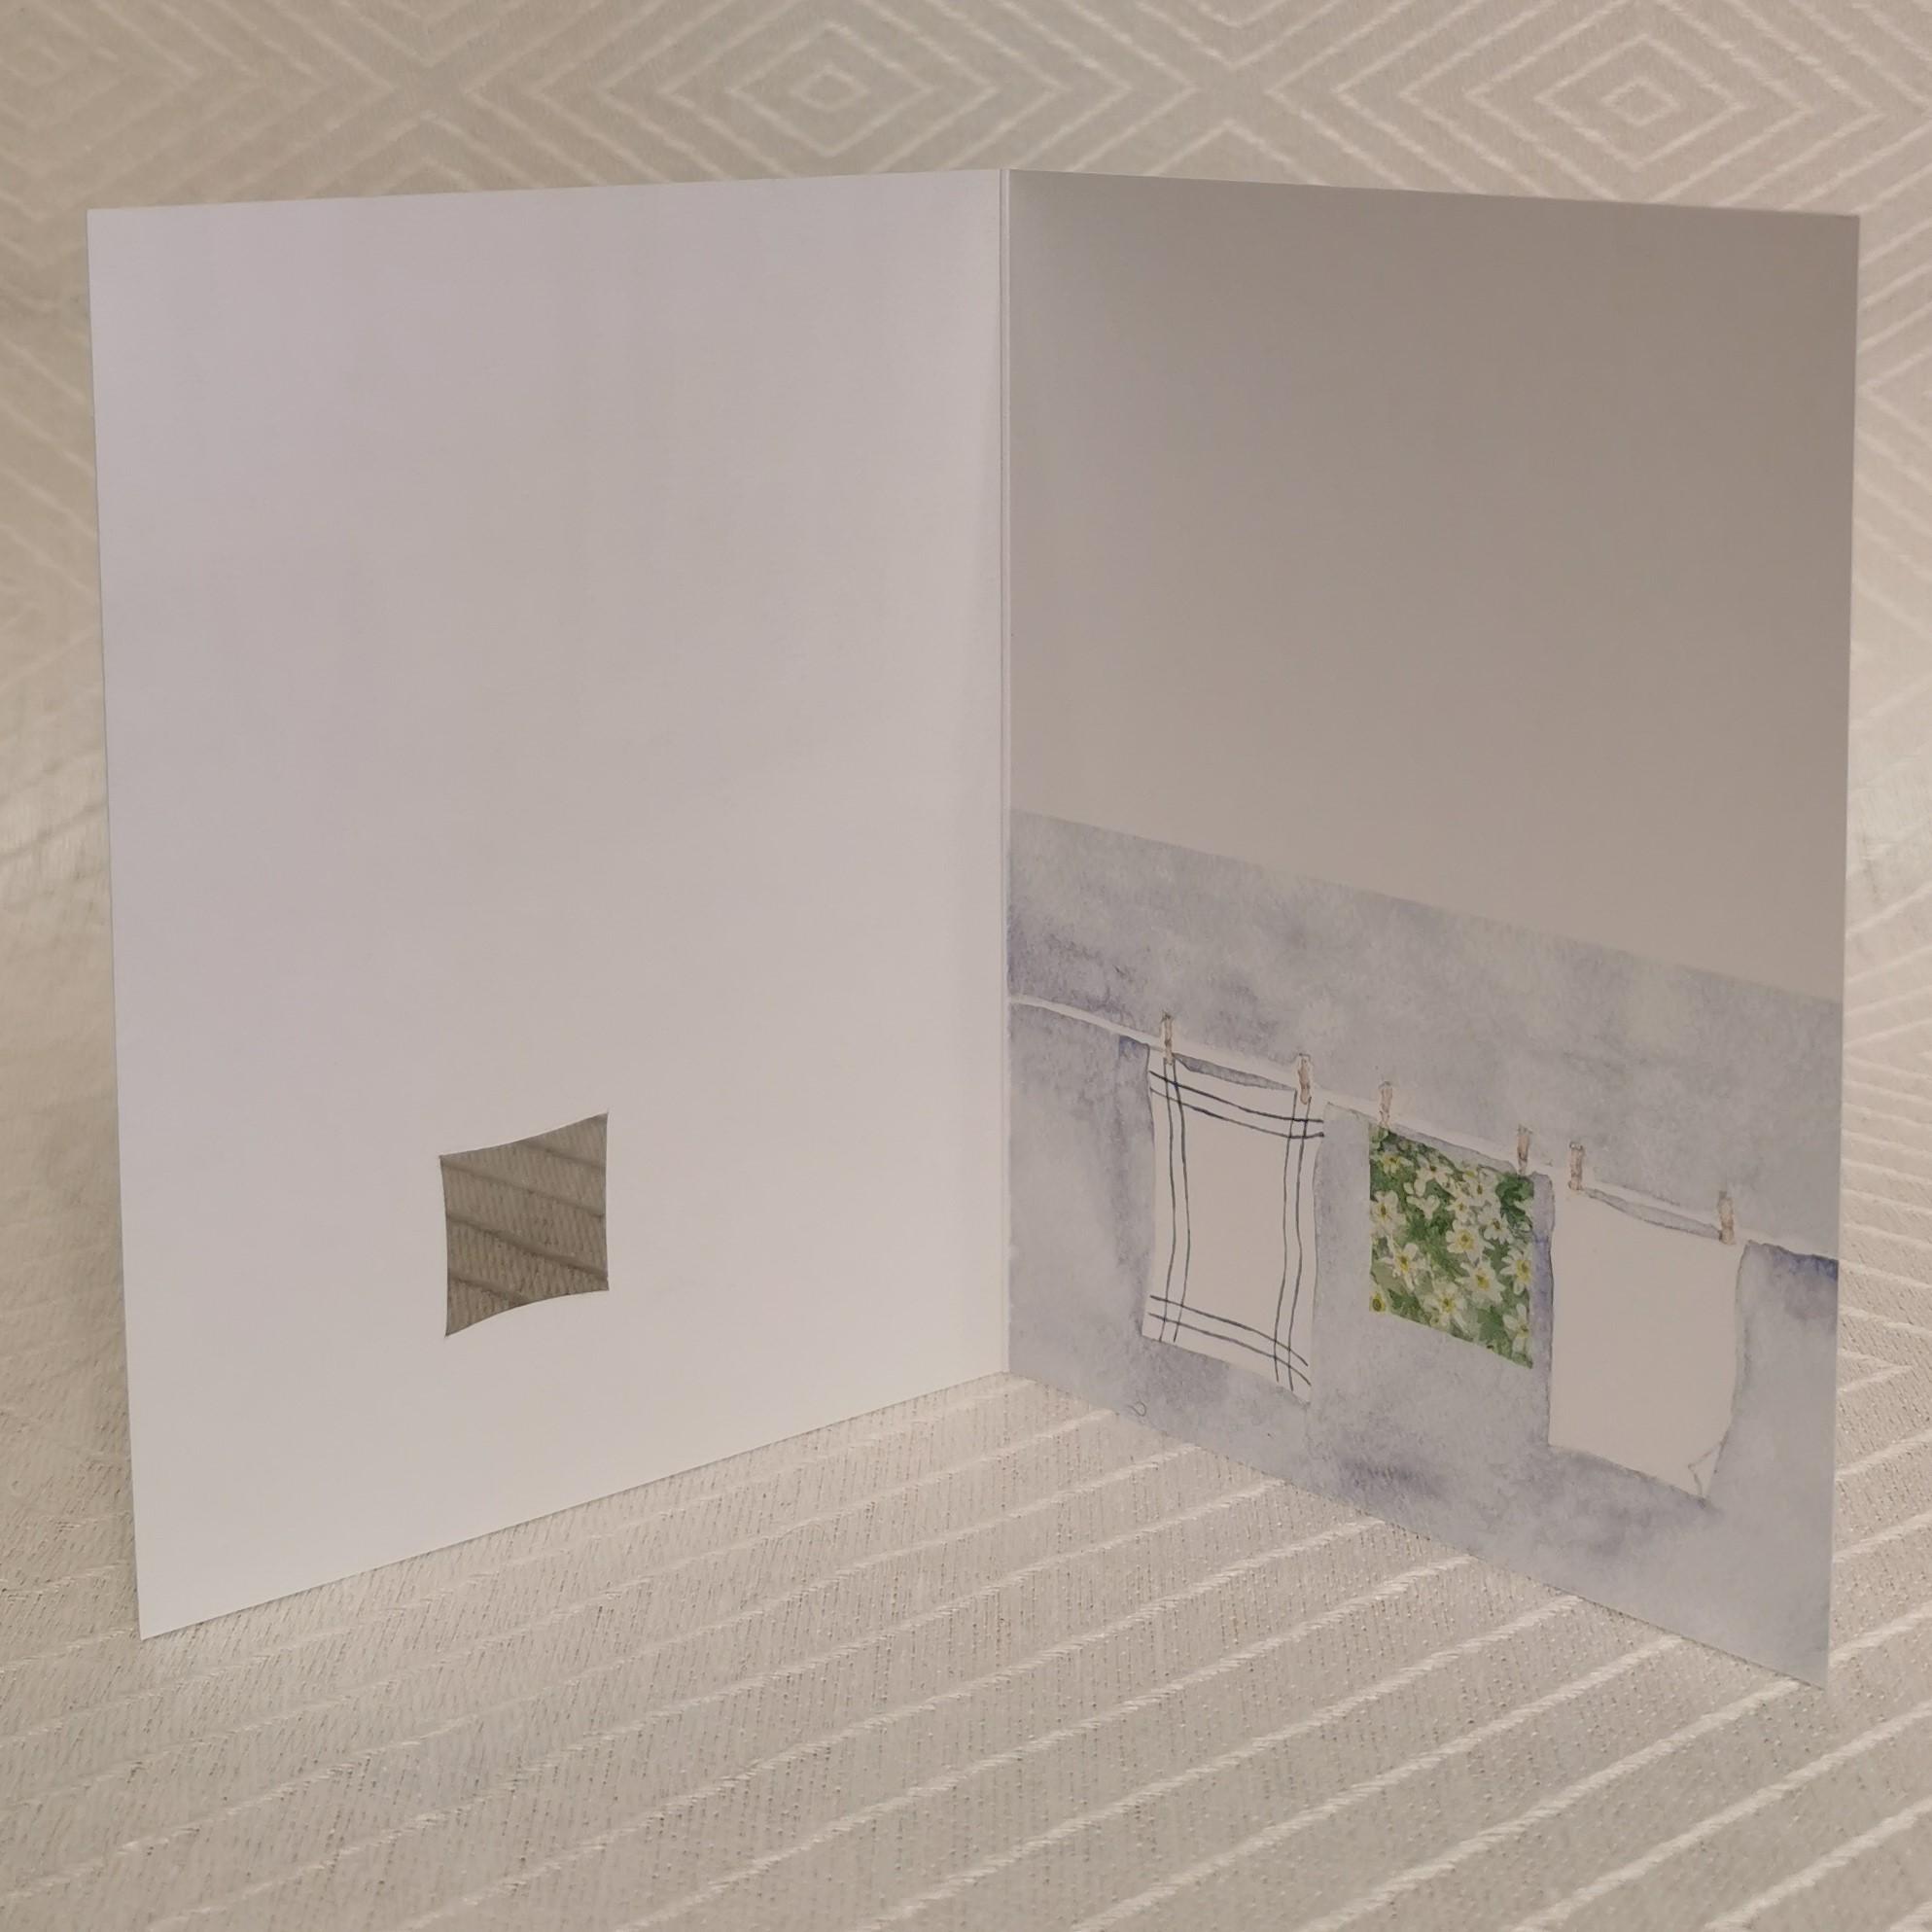 Vikt kort i akvarell med surprise insidan